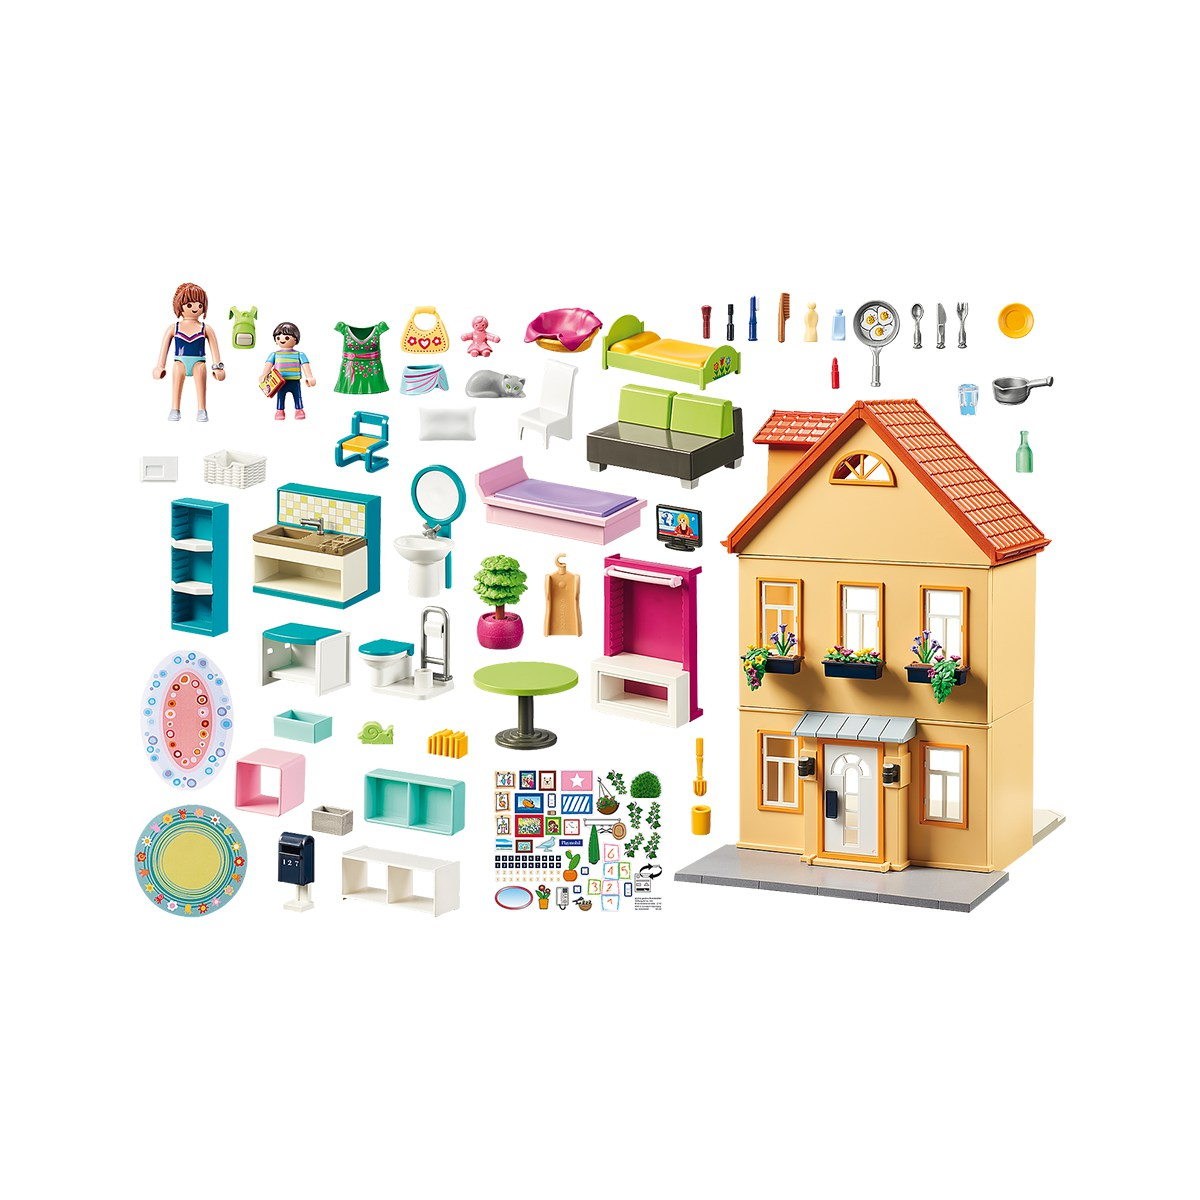 PLAYMOBIL MY PRETTY PLAY-HOUSE 70014